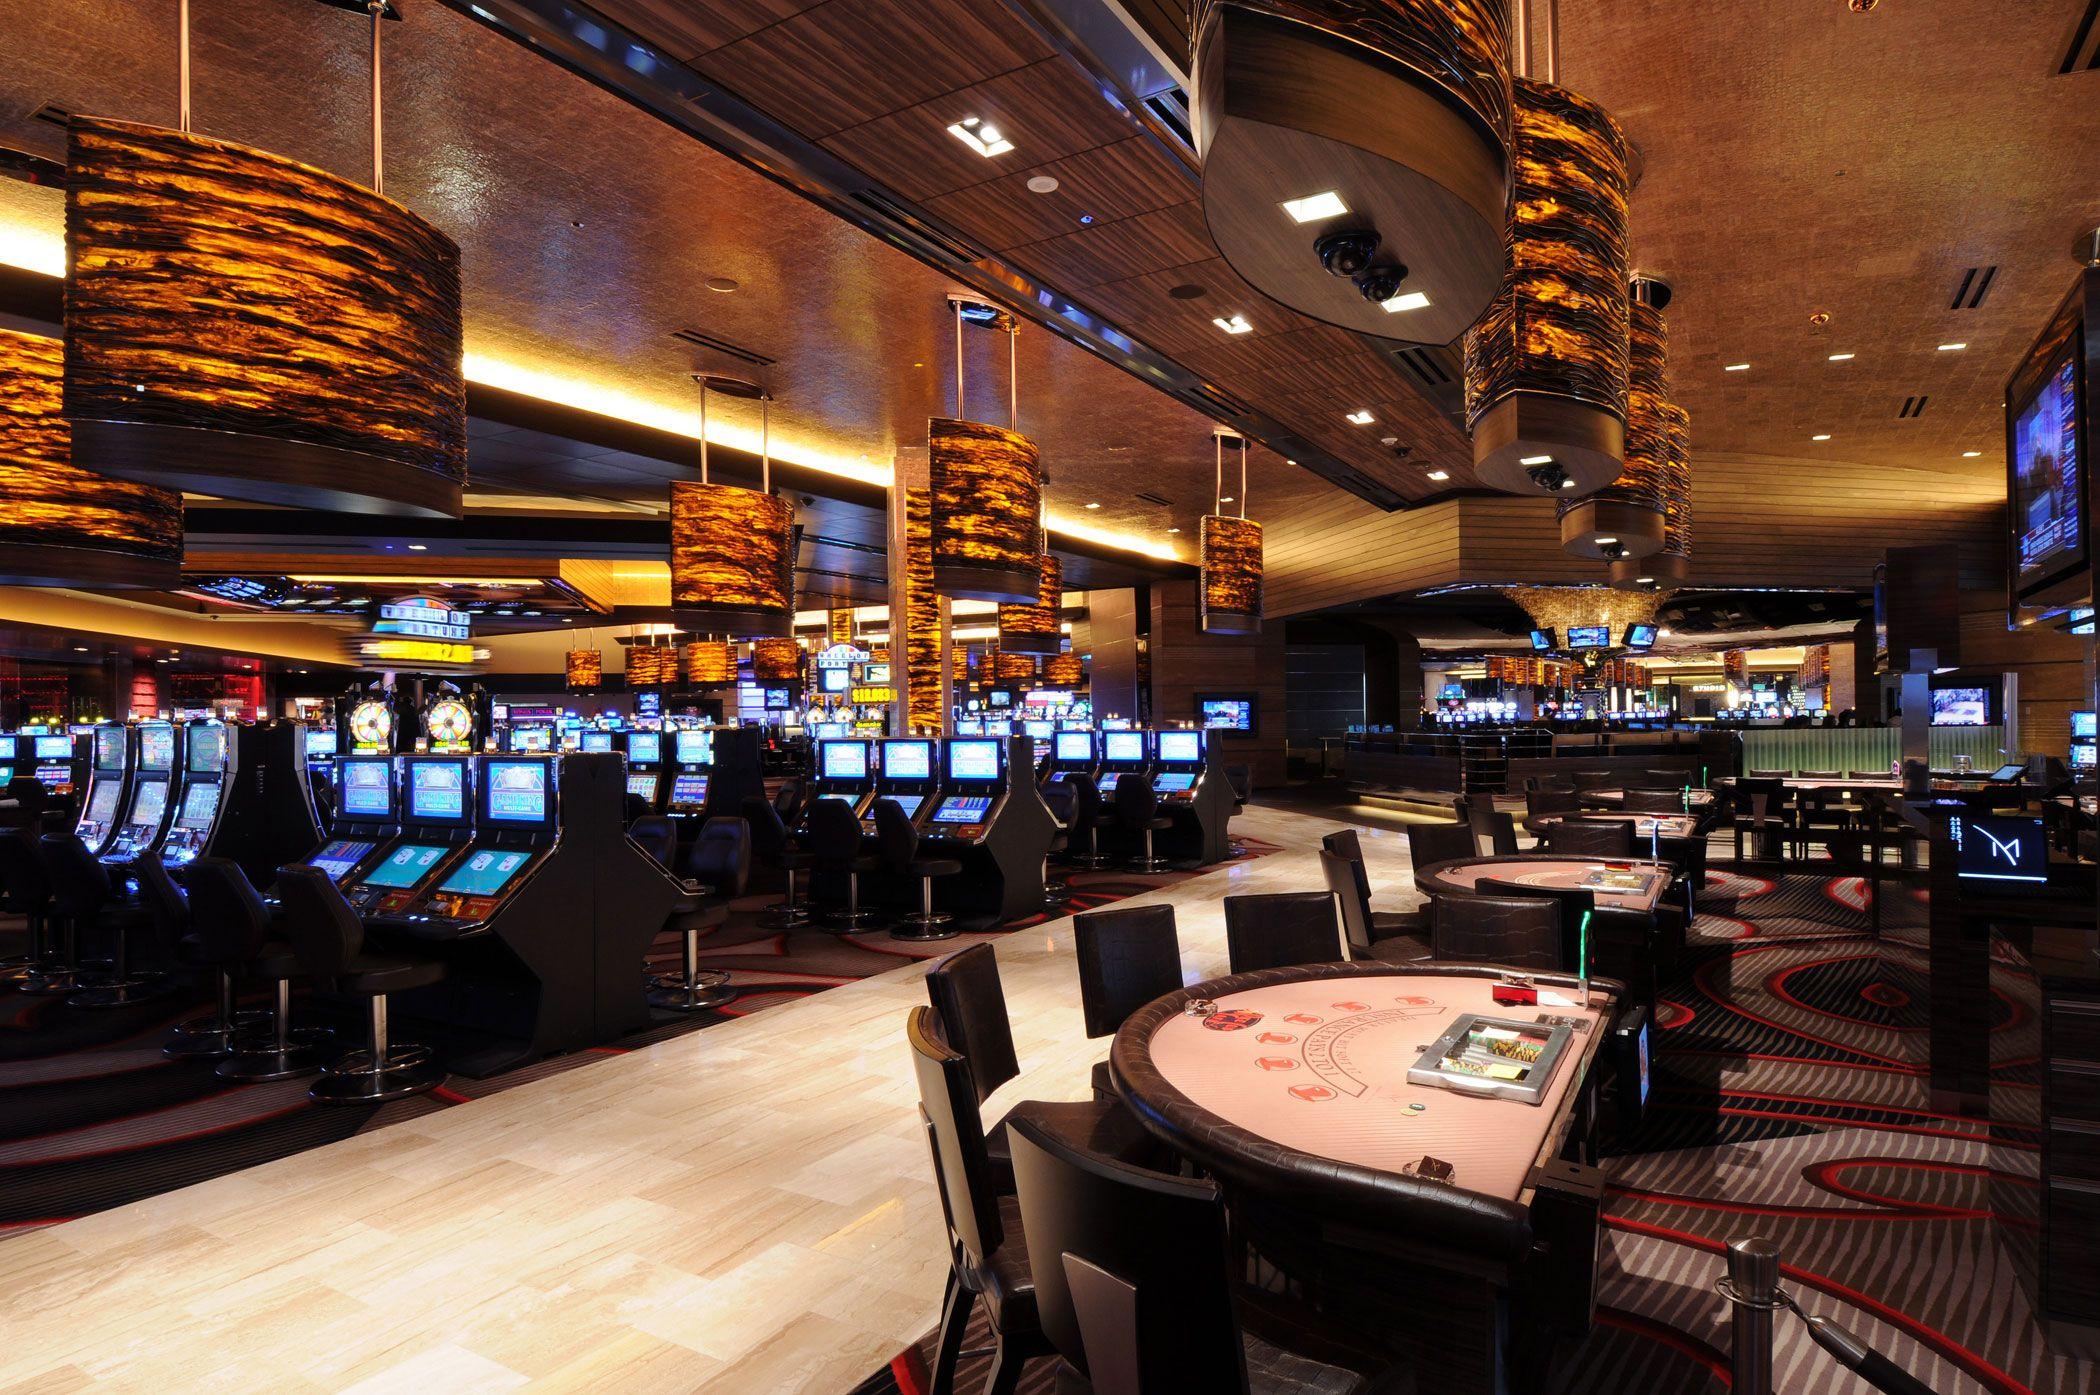 Casinos navy bistro toledo ohio downloadable casinos play free